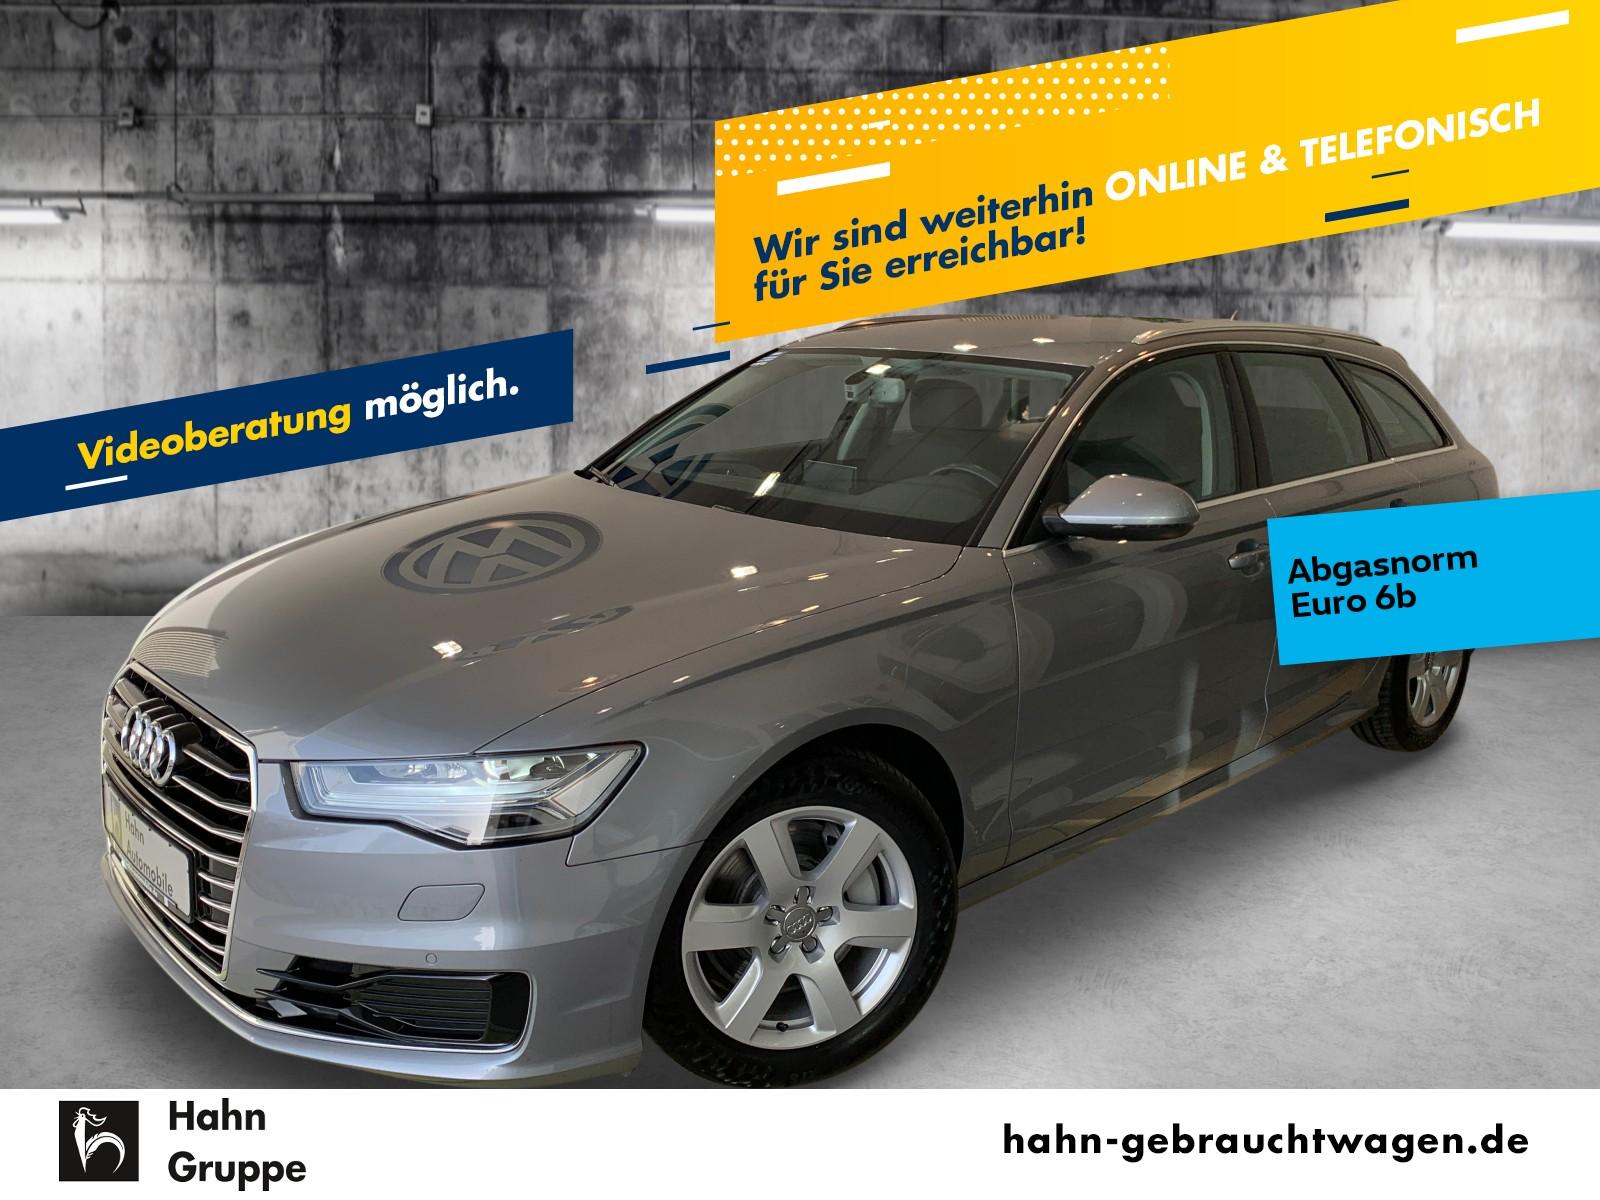 Audi A6 Avant 3,0TDI quattro Stronic Navi AHK LED SHZ, Jahr 2015, Diesel